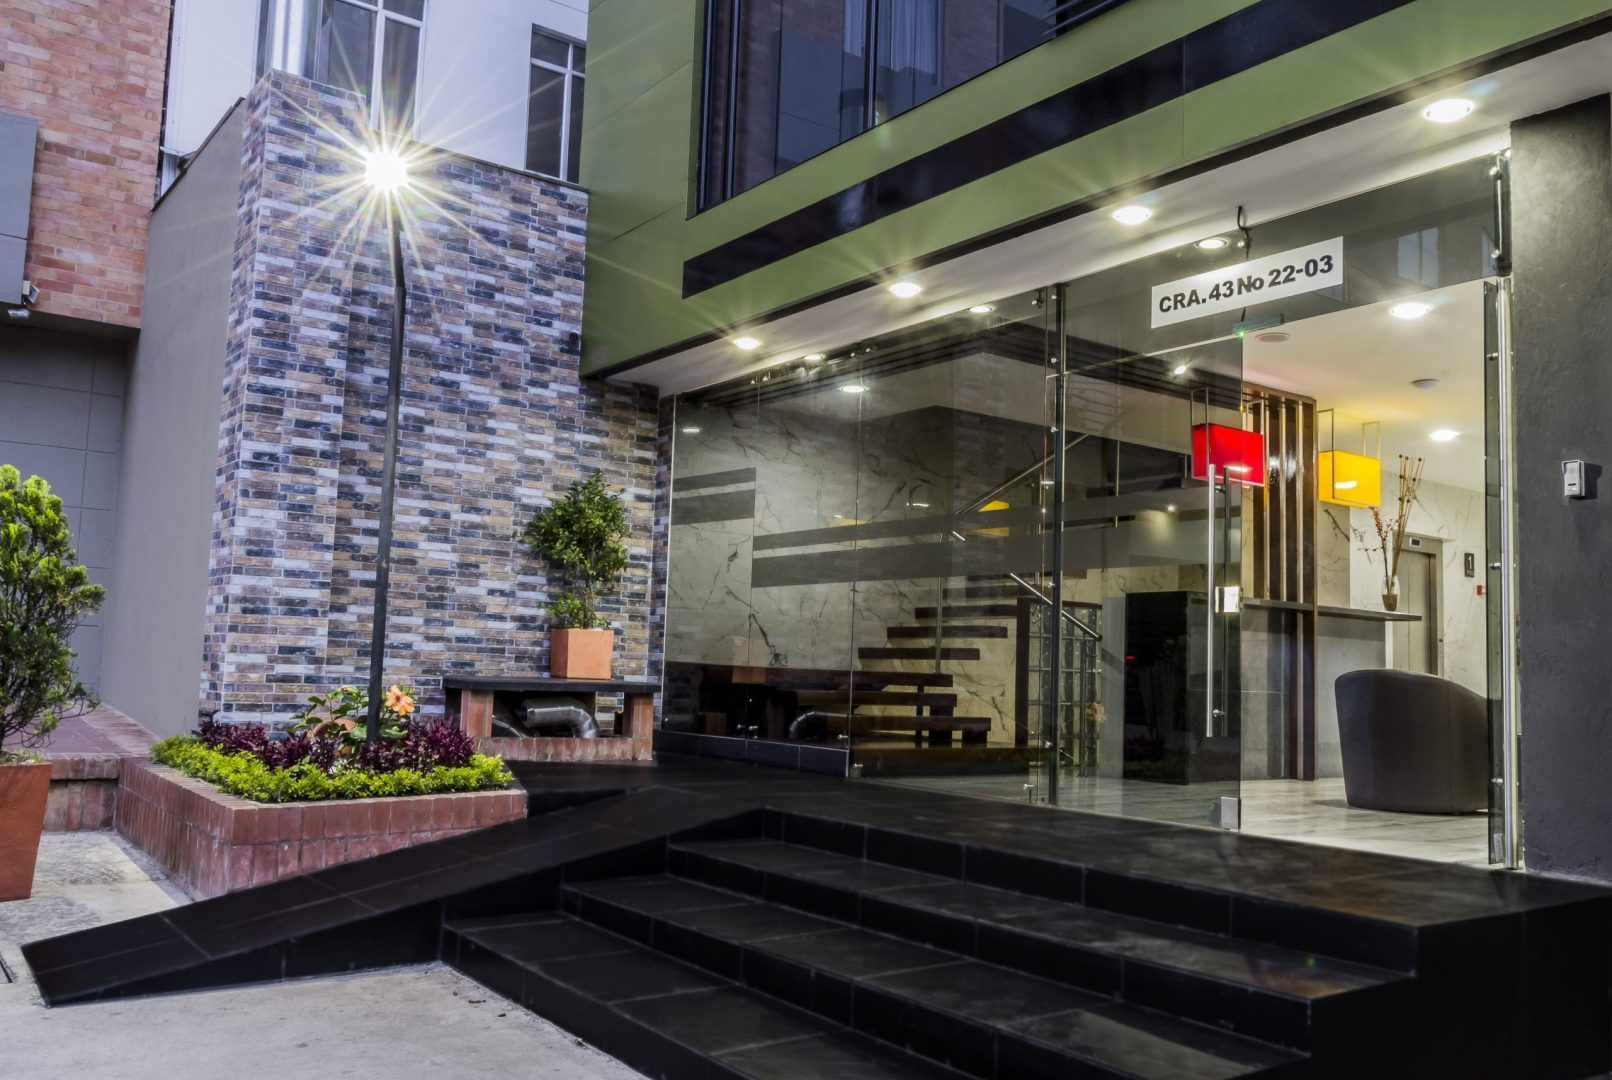 HOTEL REGENCY BOUTIQUE LA FERIA